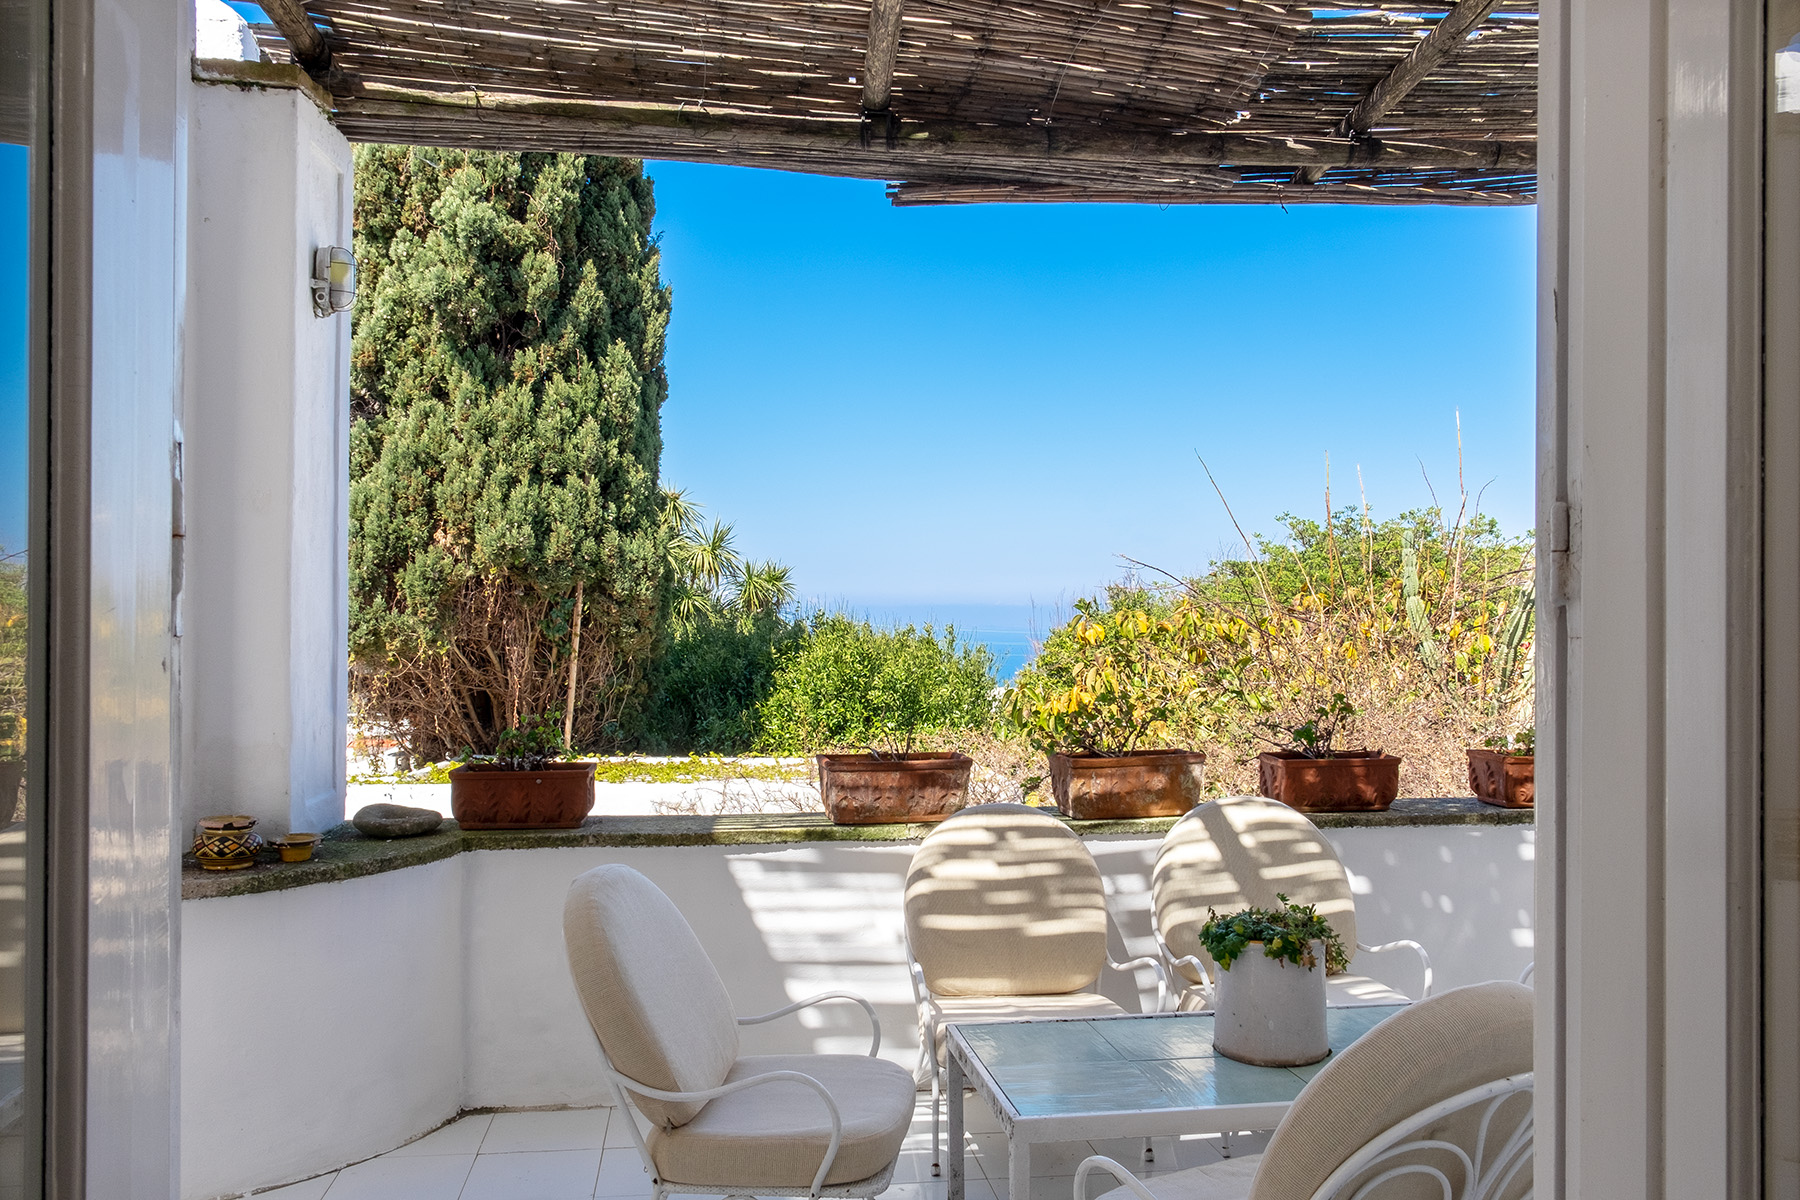 Casa indipendente in Vendita a Capri: 5 locali, 300 mq - Foto 10